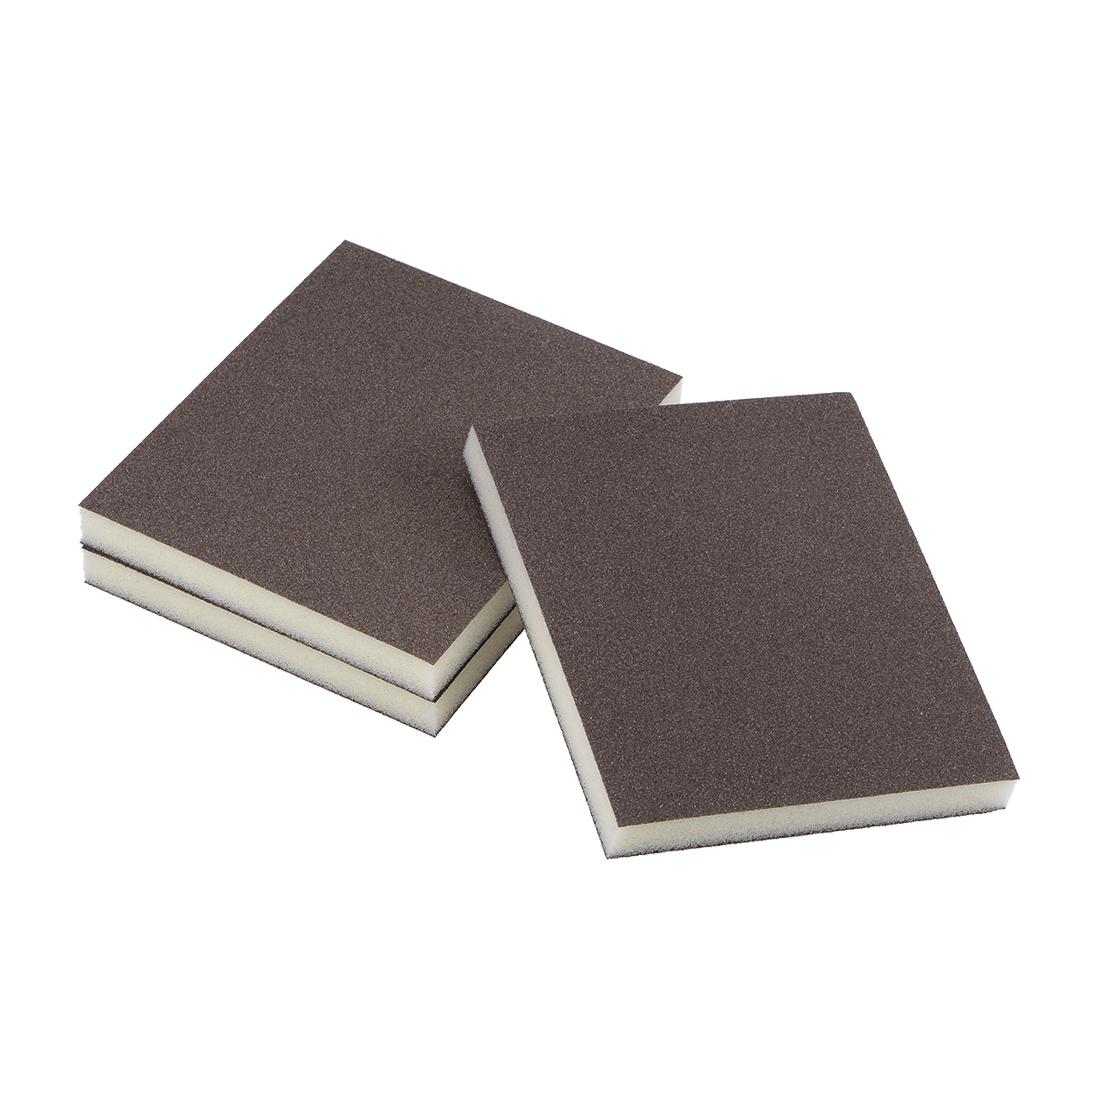 Sanding Sponge 180 Grit Sanding Block Pad Brown 3pcs